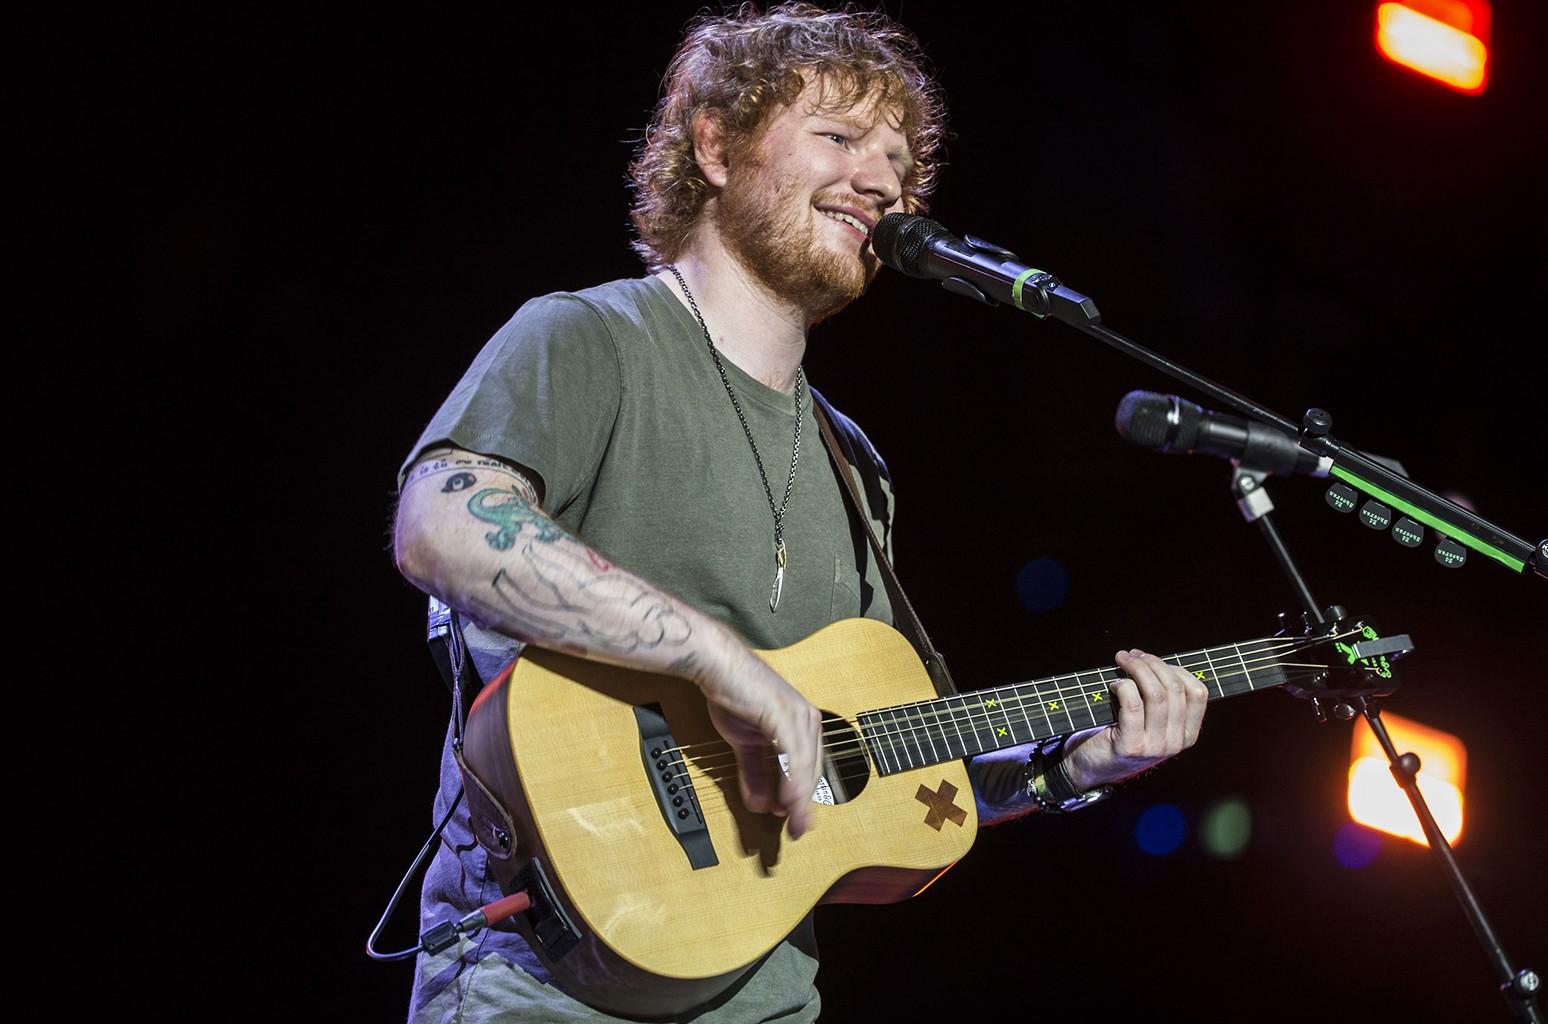 Ed Sheeran performs at Suncorp Stadium on Nov. 28, 2015 in Brisbane, Australia.